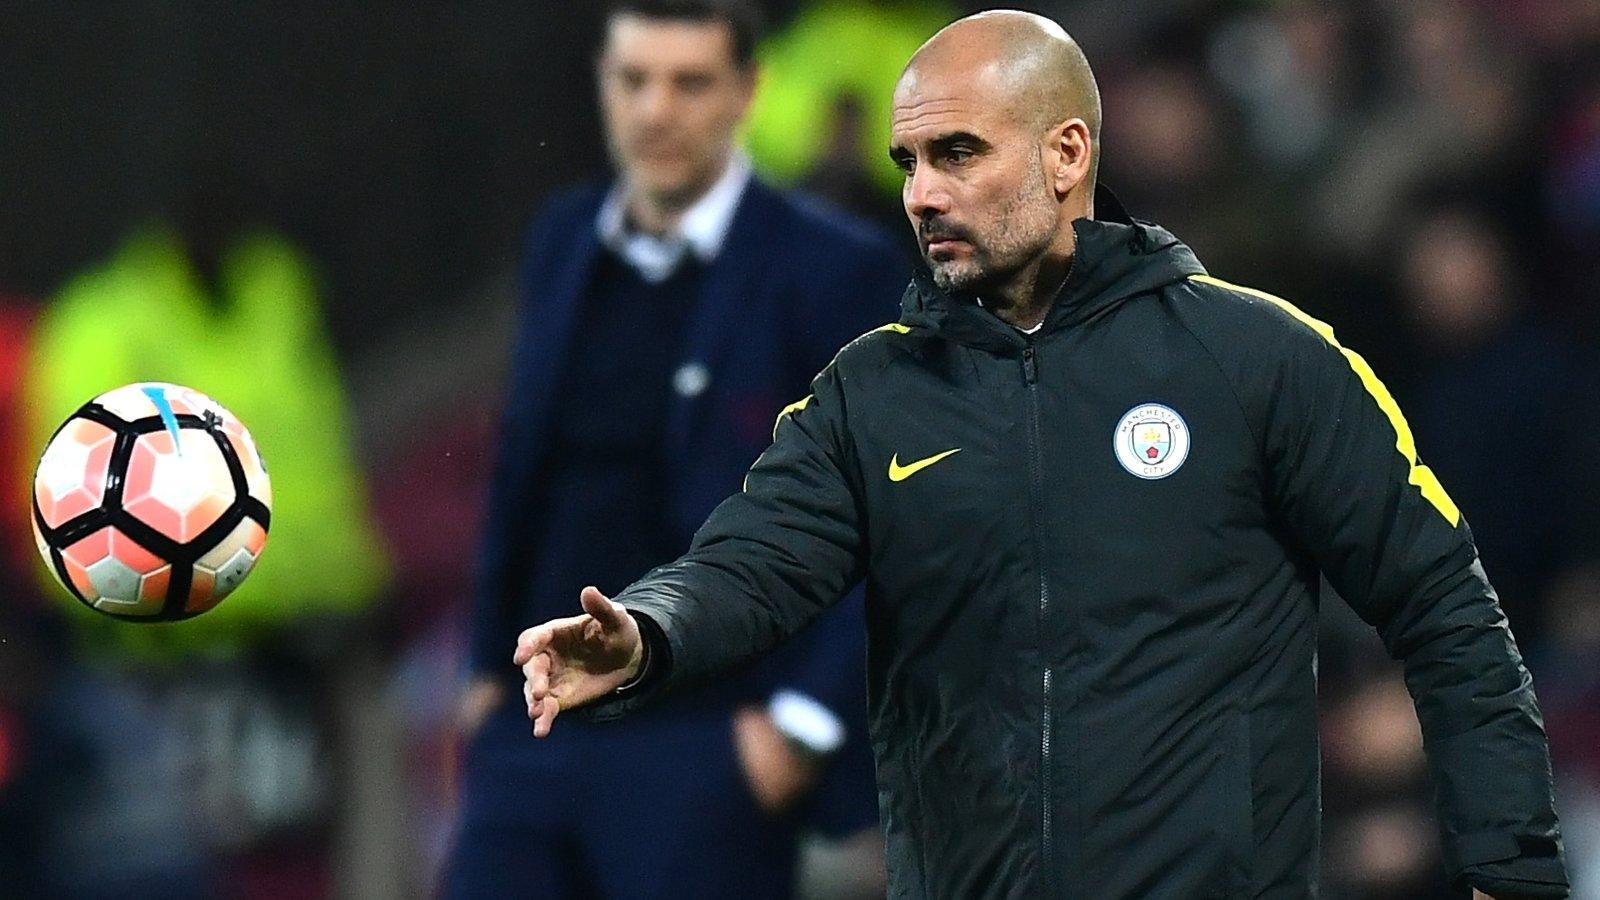 Guardiola - Man City